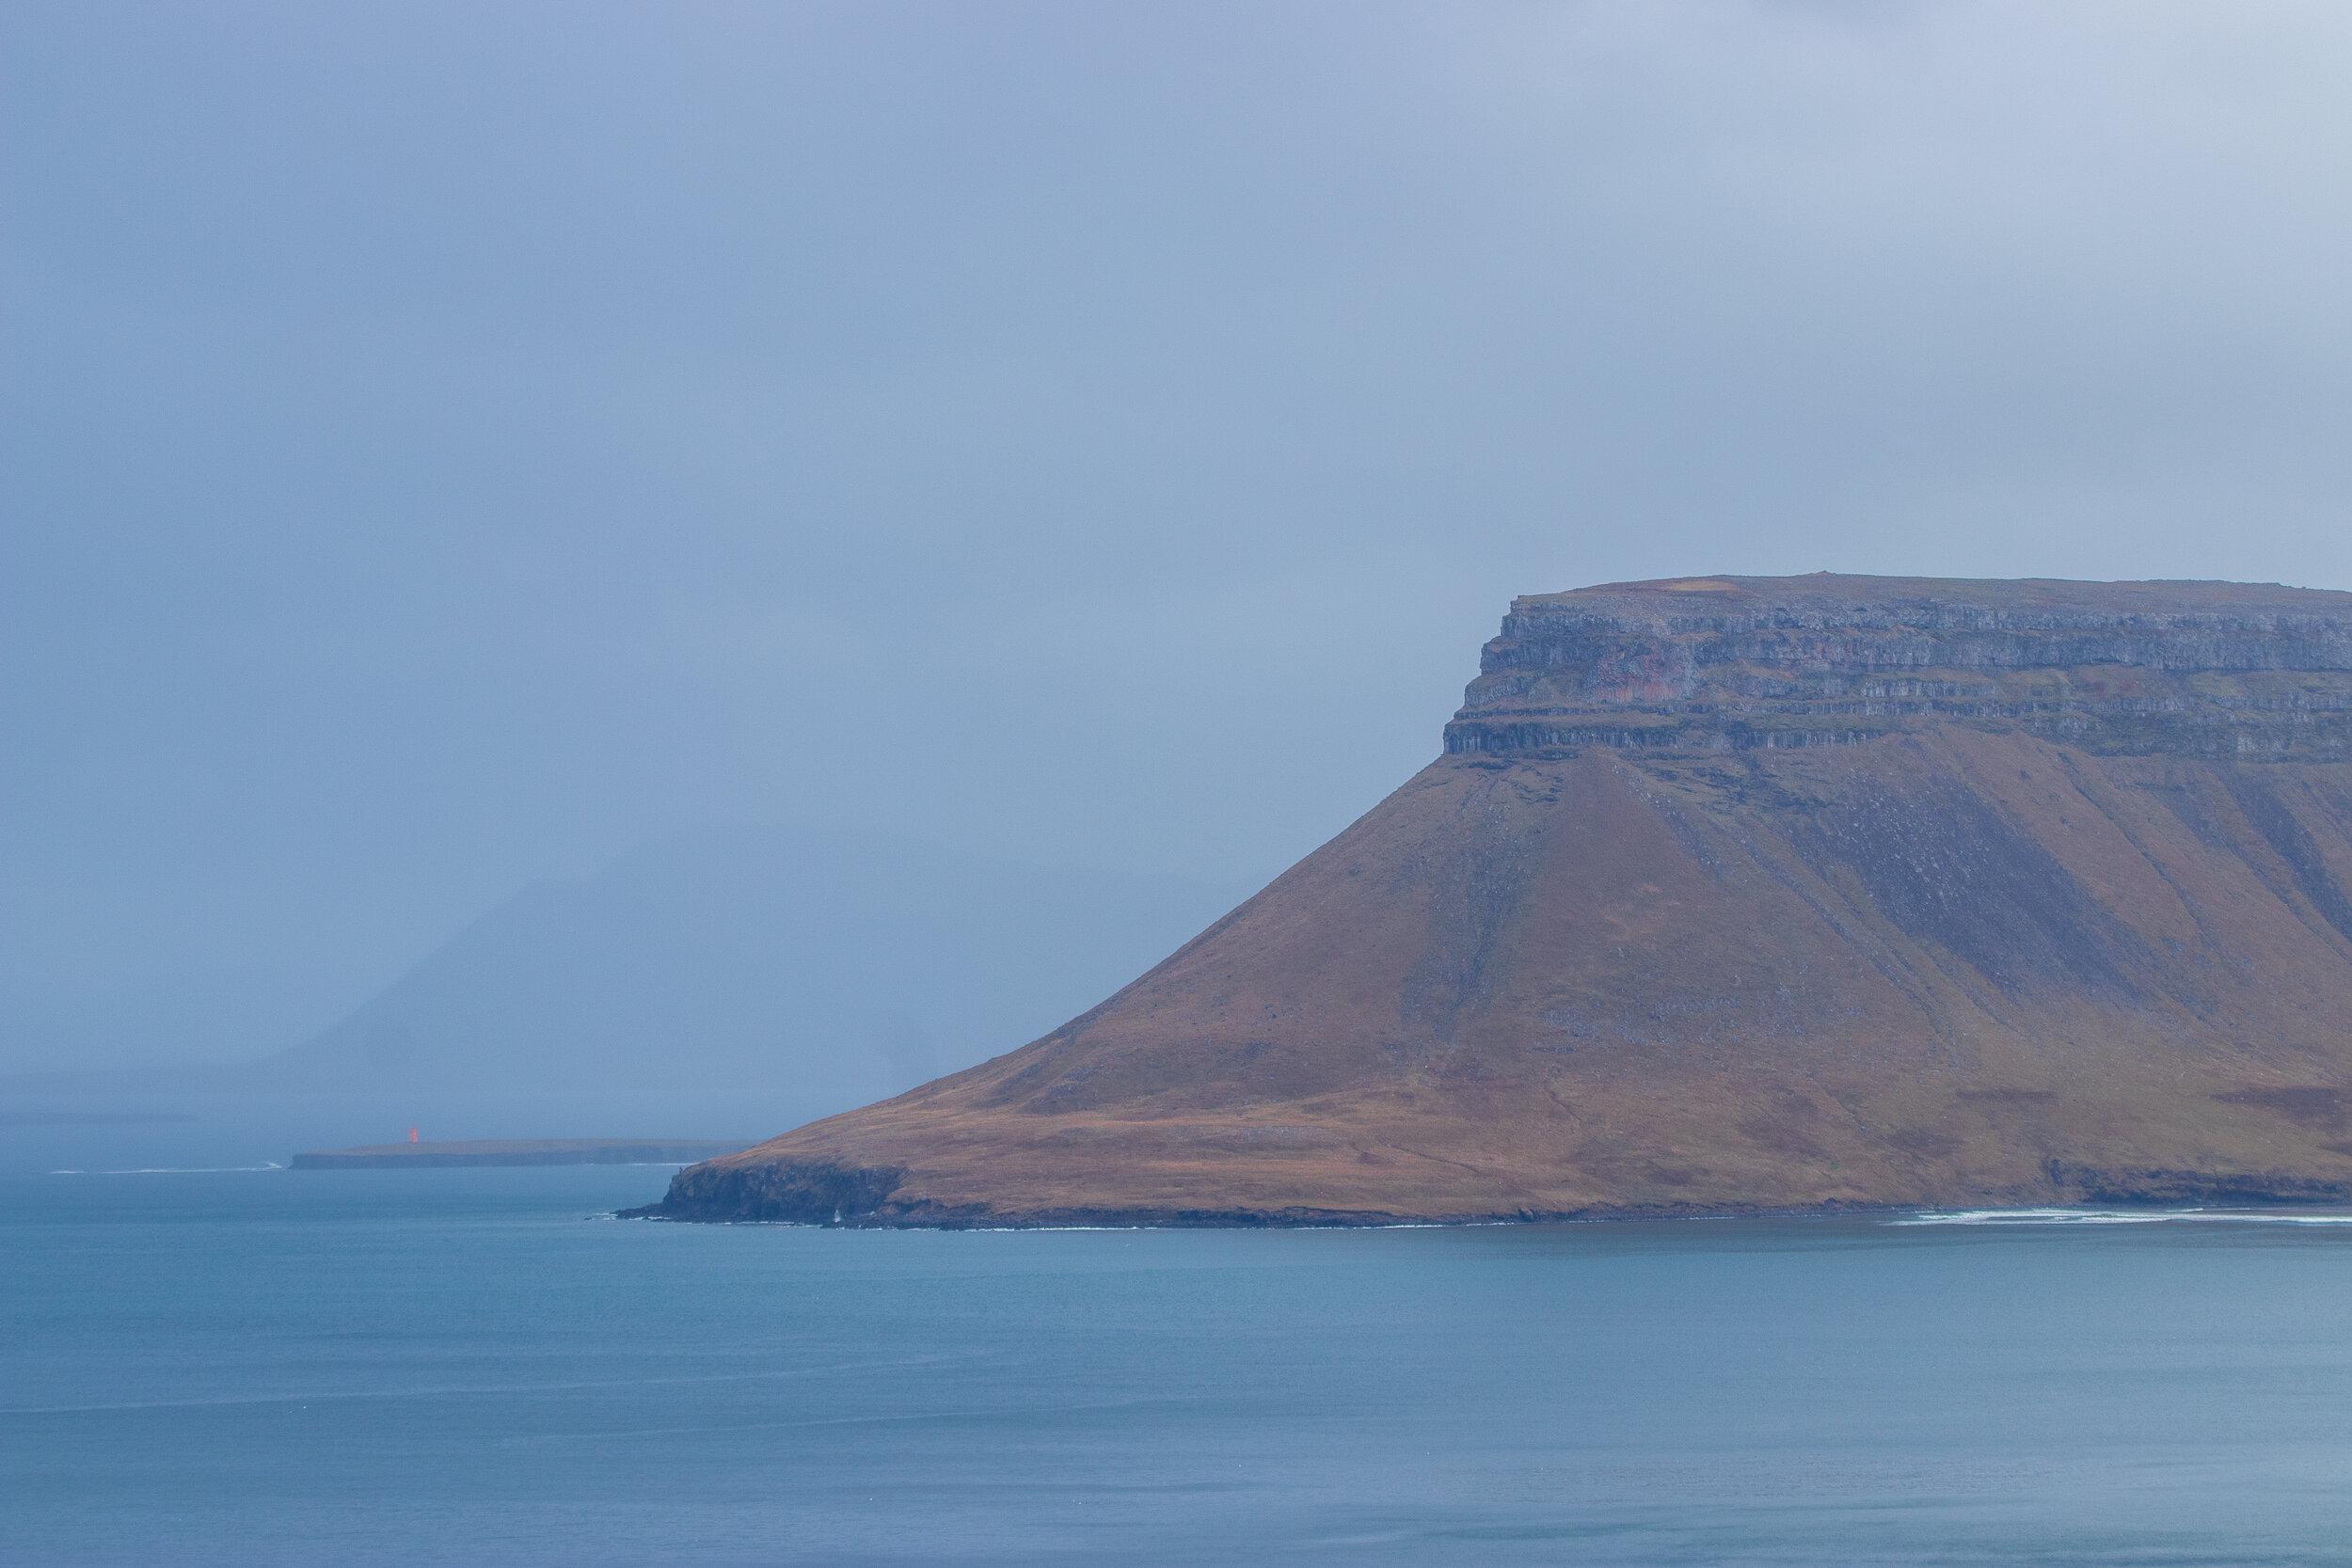 A little north of Grundarfjörður looking East on the North side of the Snæfellsnes peninsula.